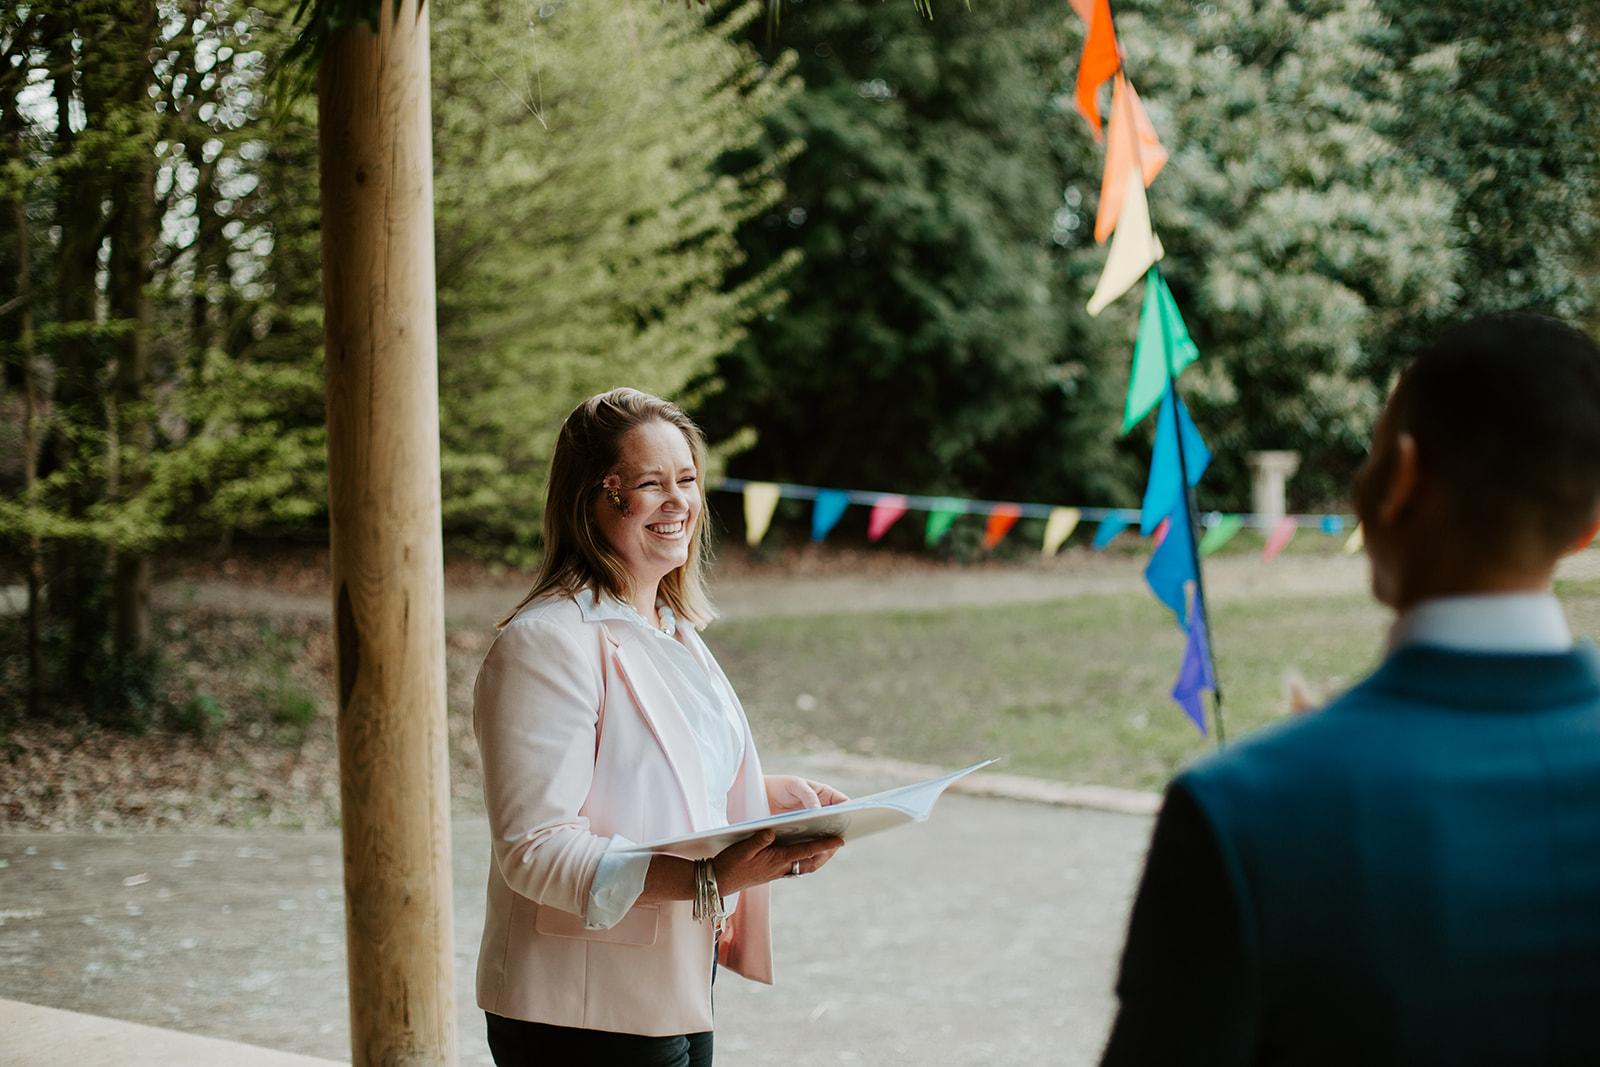 celebrant wedding ceremony - celebrant ceremony - wedding celebrant